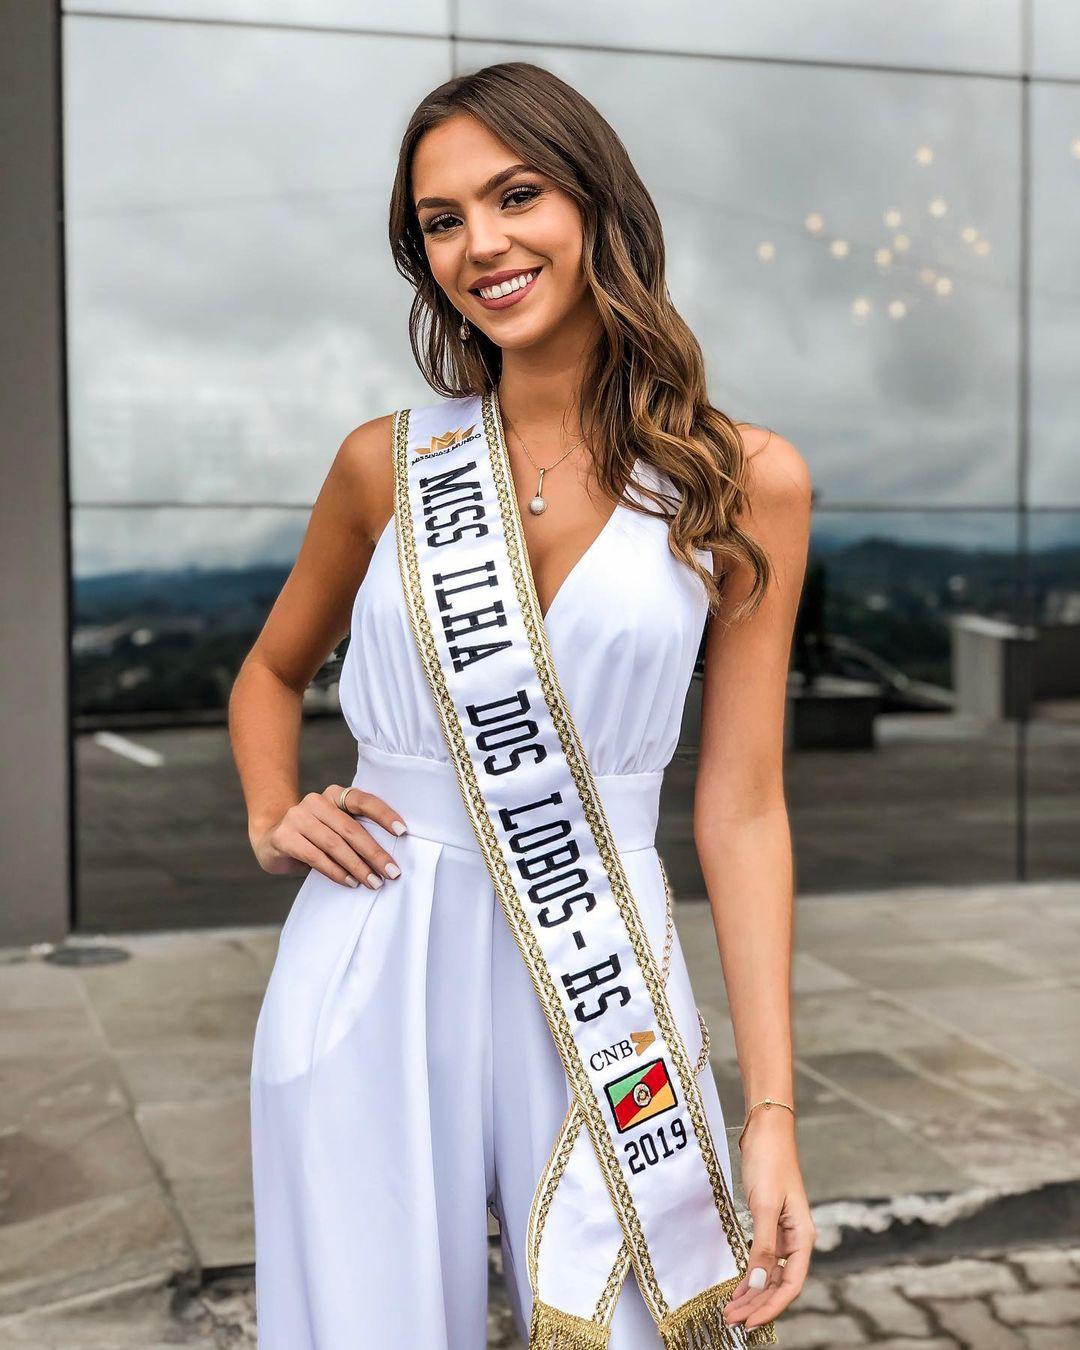 ana flavia giacomini, miss ilha dos lobos mundo 2019. - Página 8 Fwxdi210